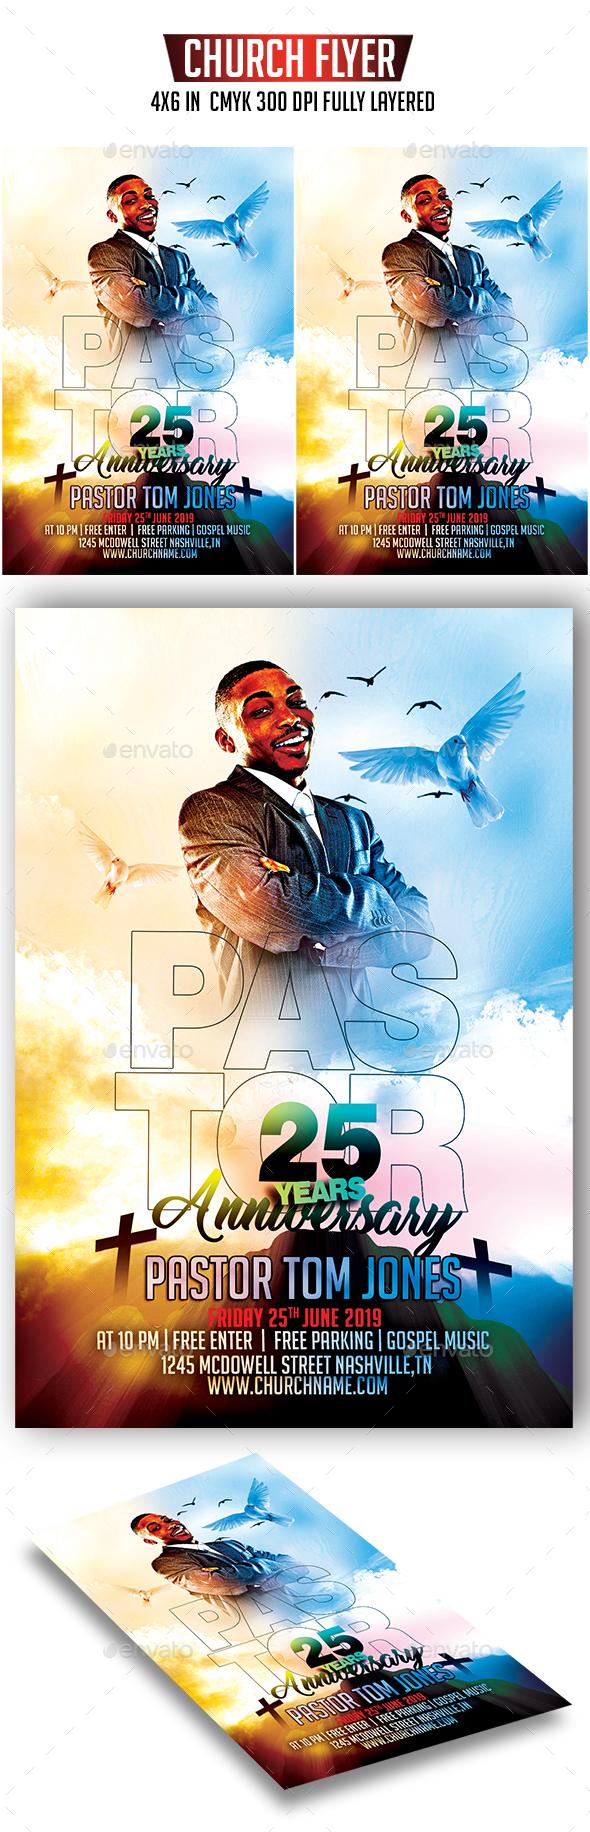 Pastor Anniversary Flyer - Church Flyers